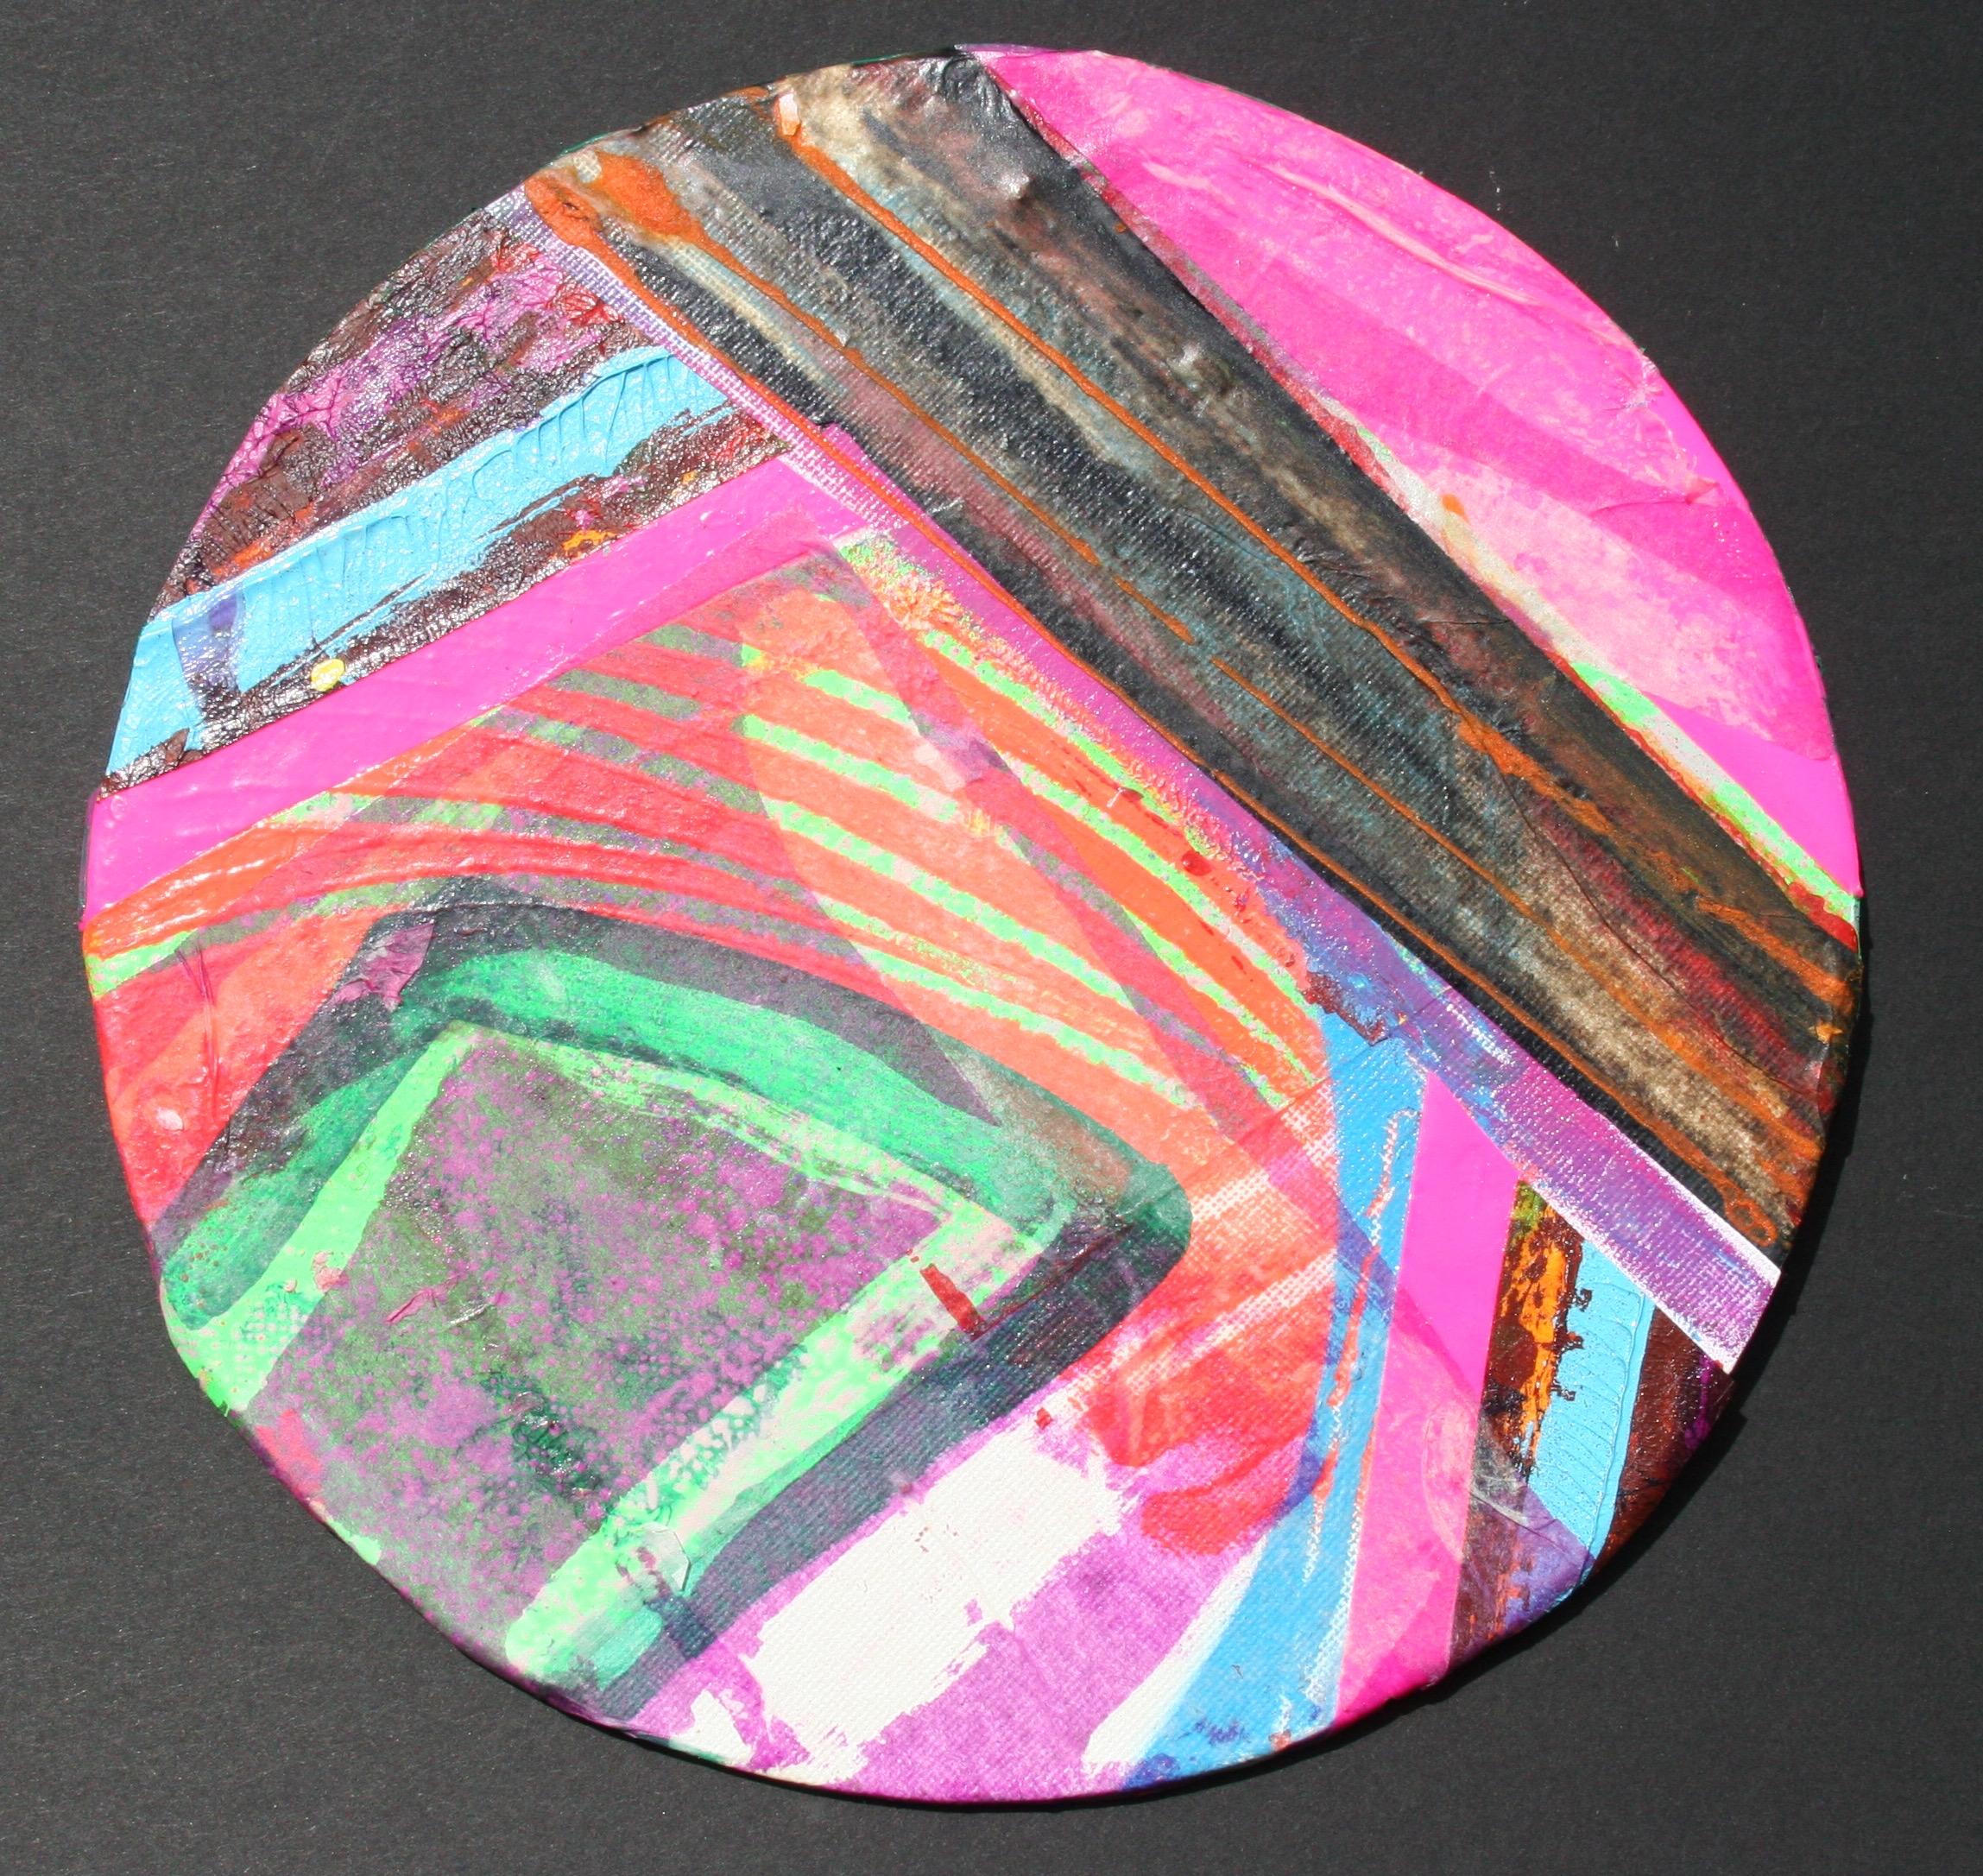 Tondos - Circular Paintings